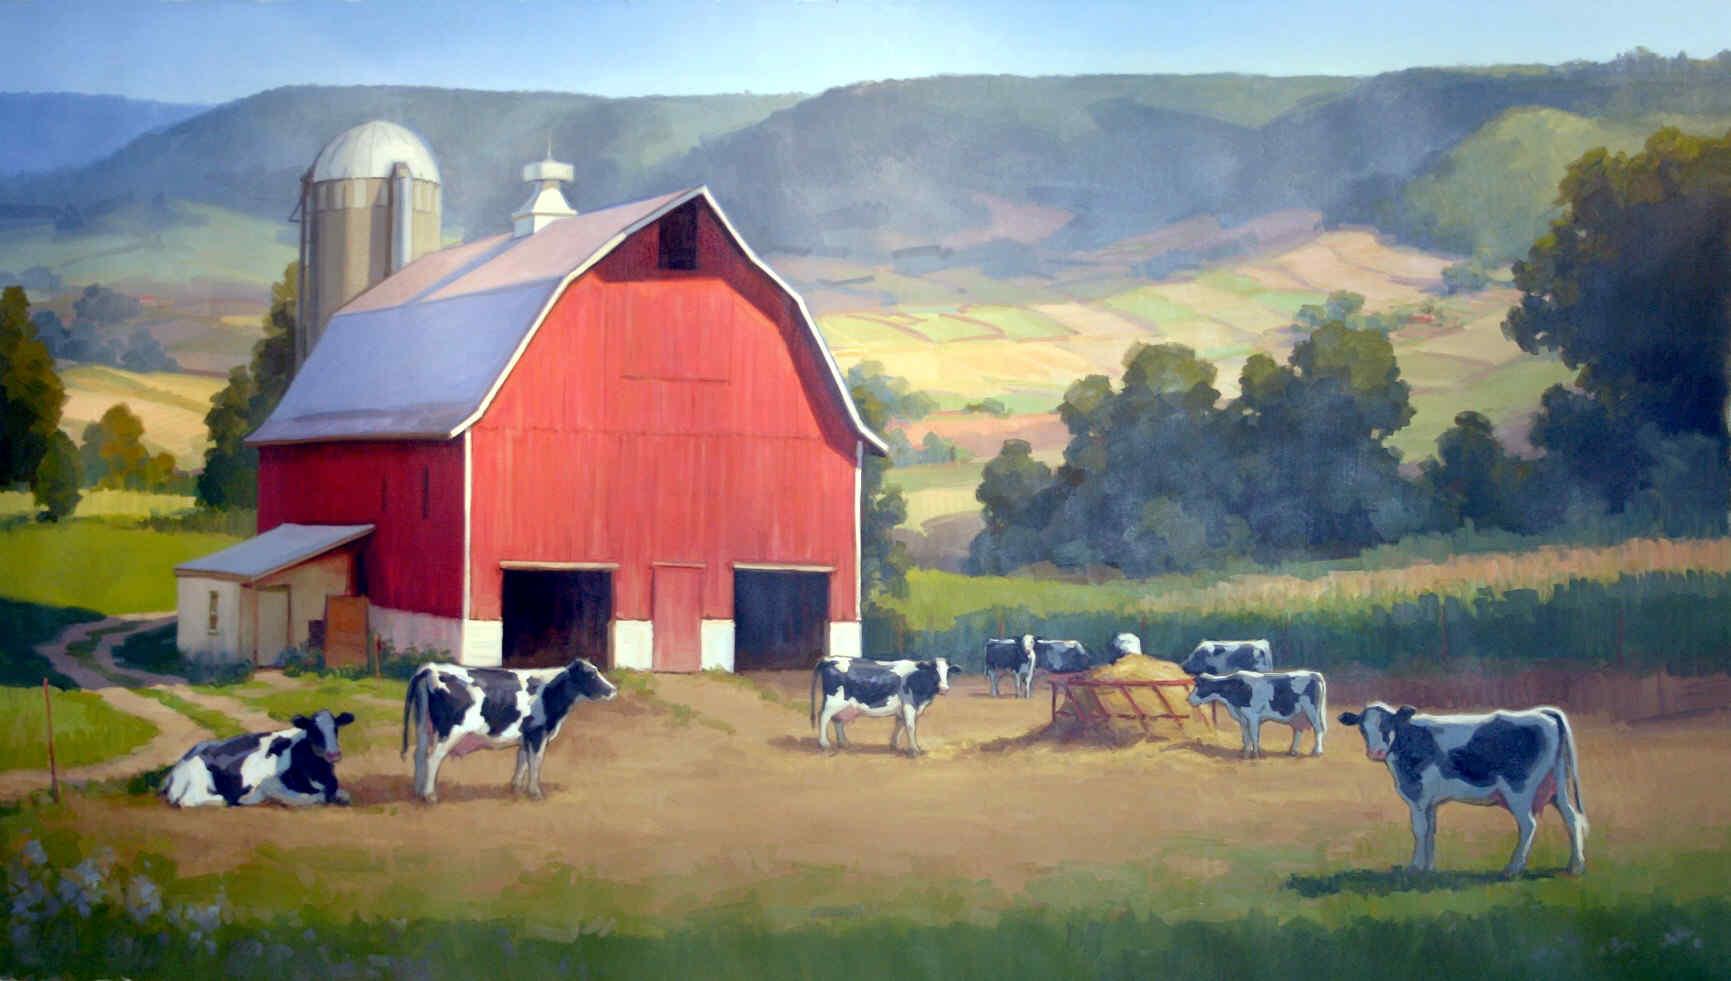 Feilds clipart dairy farm Barns Free New Hd Wallpaper